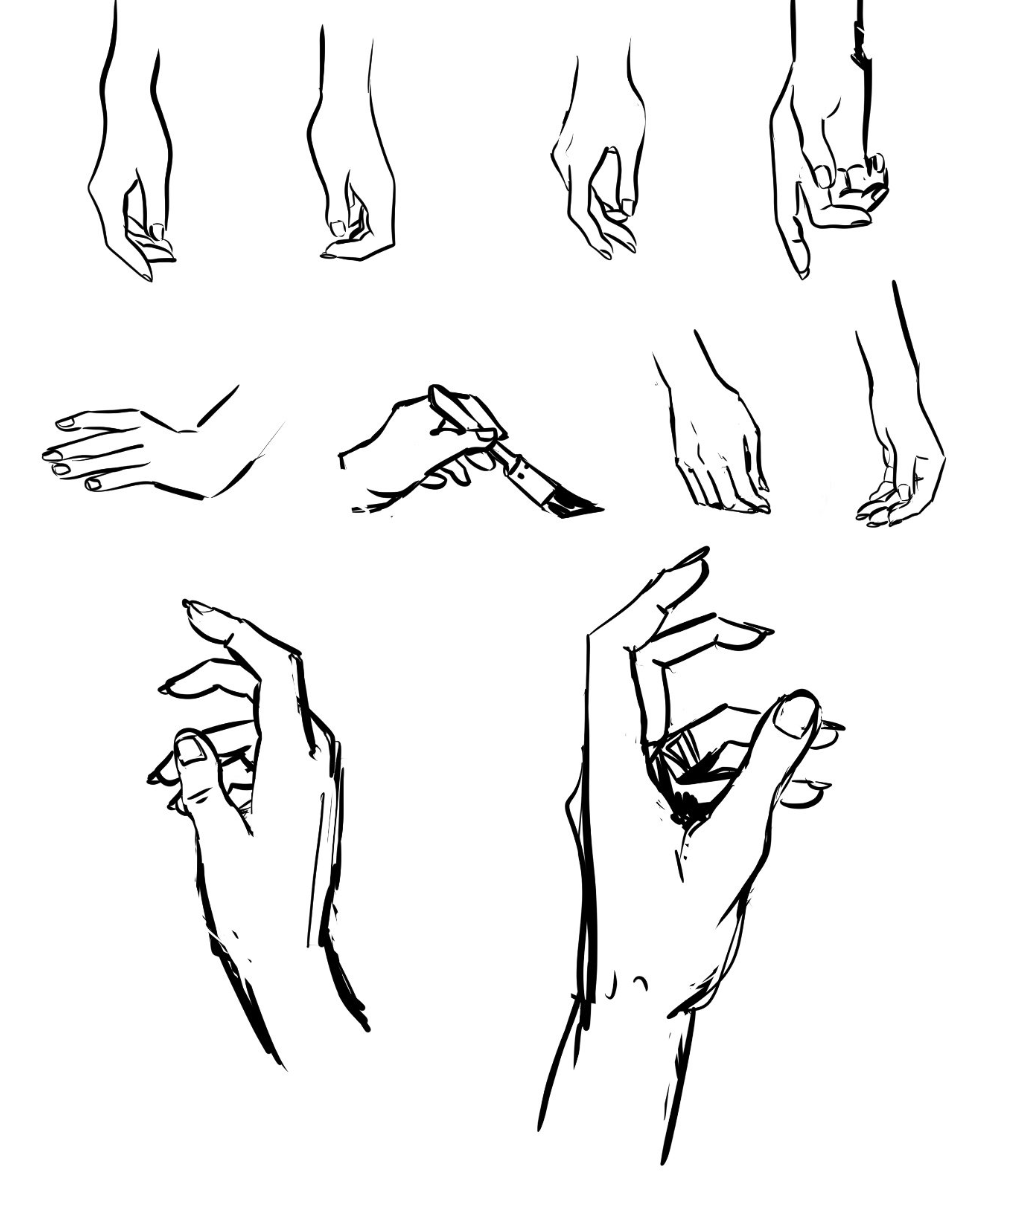 becky jewell artist hands drawing hands.png